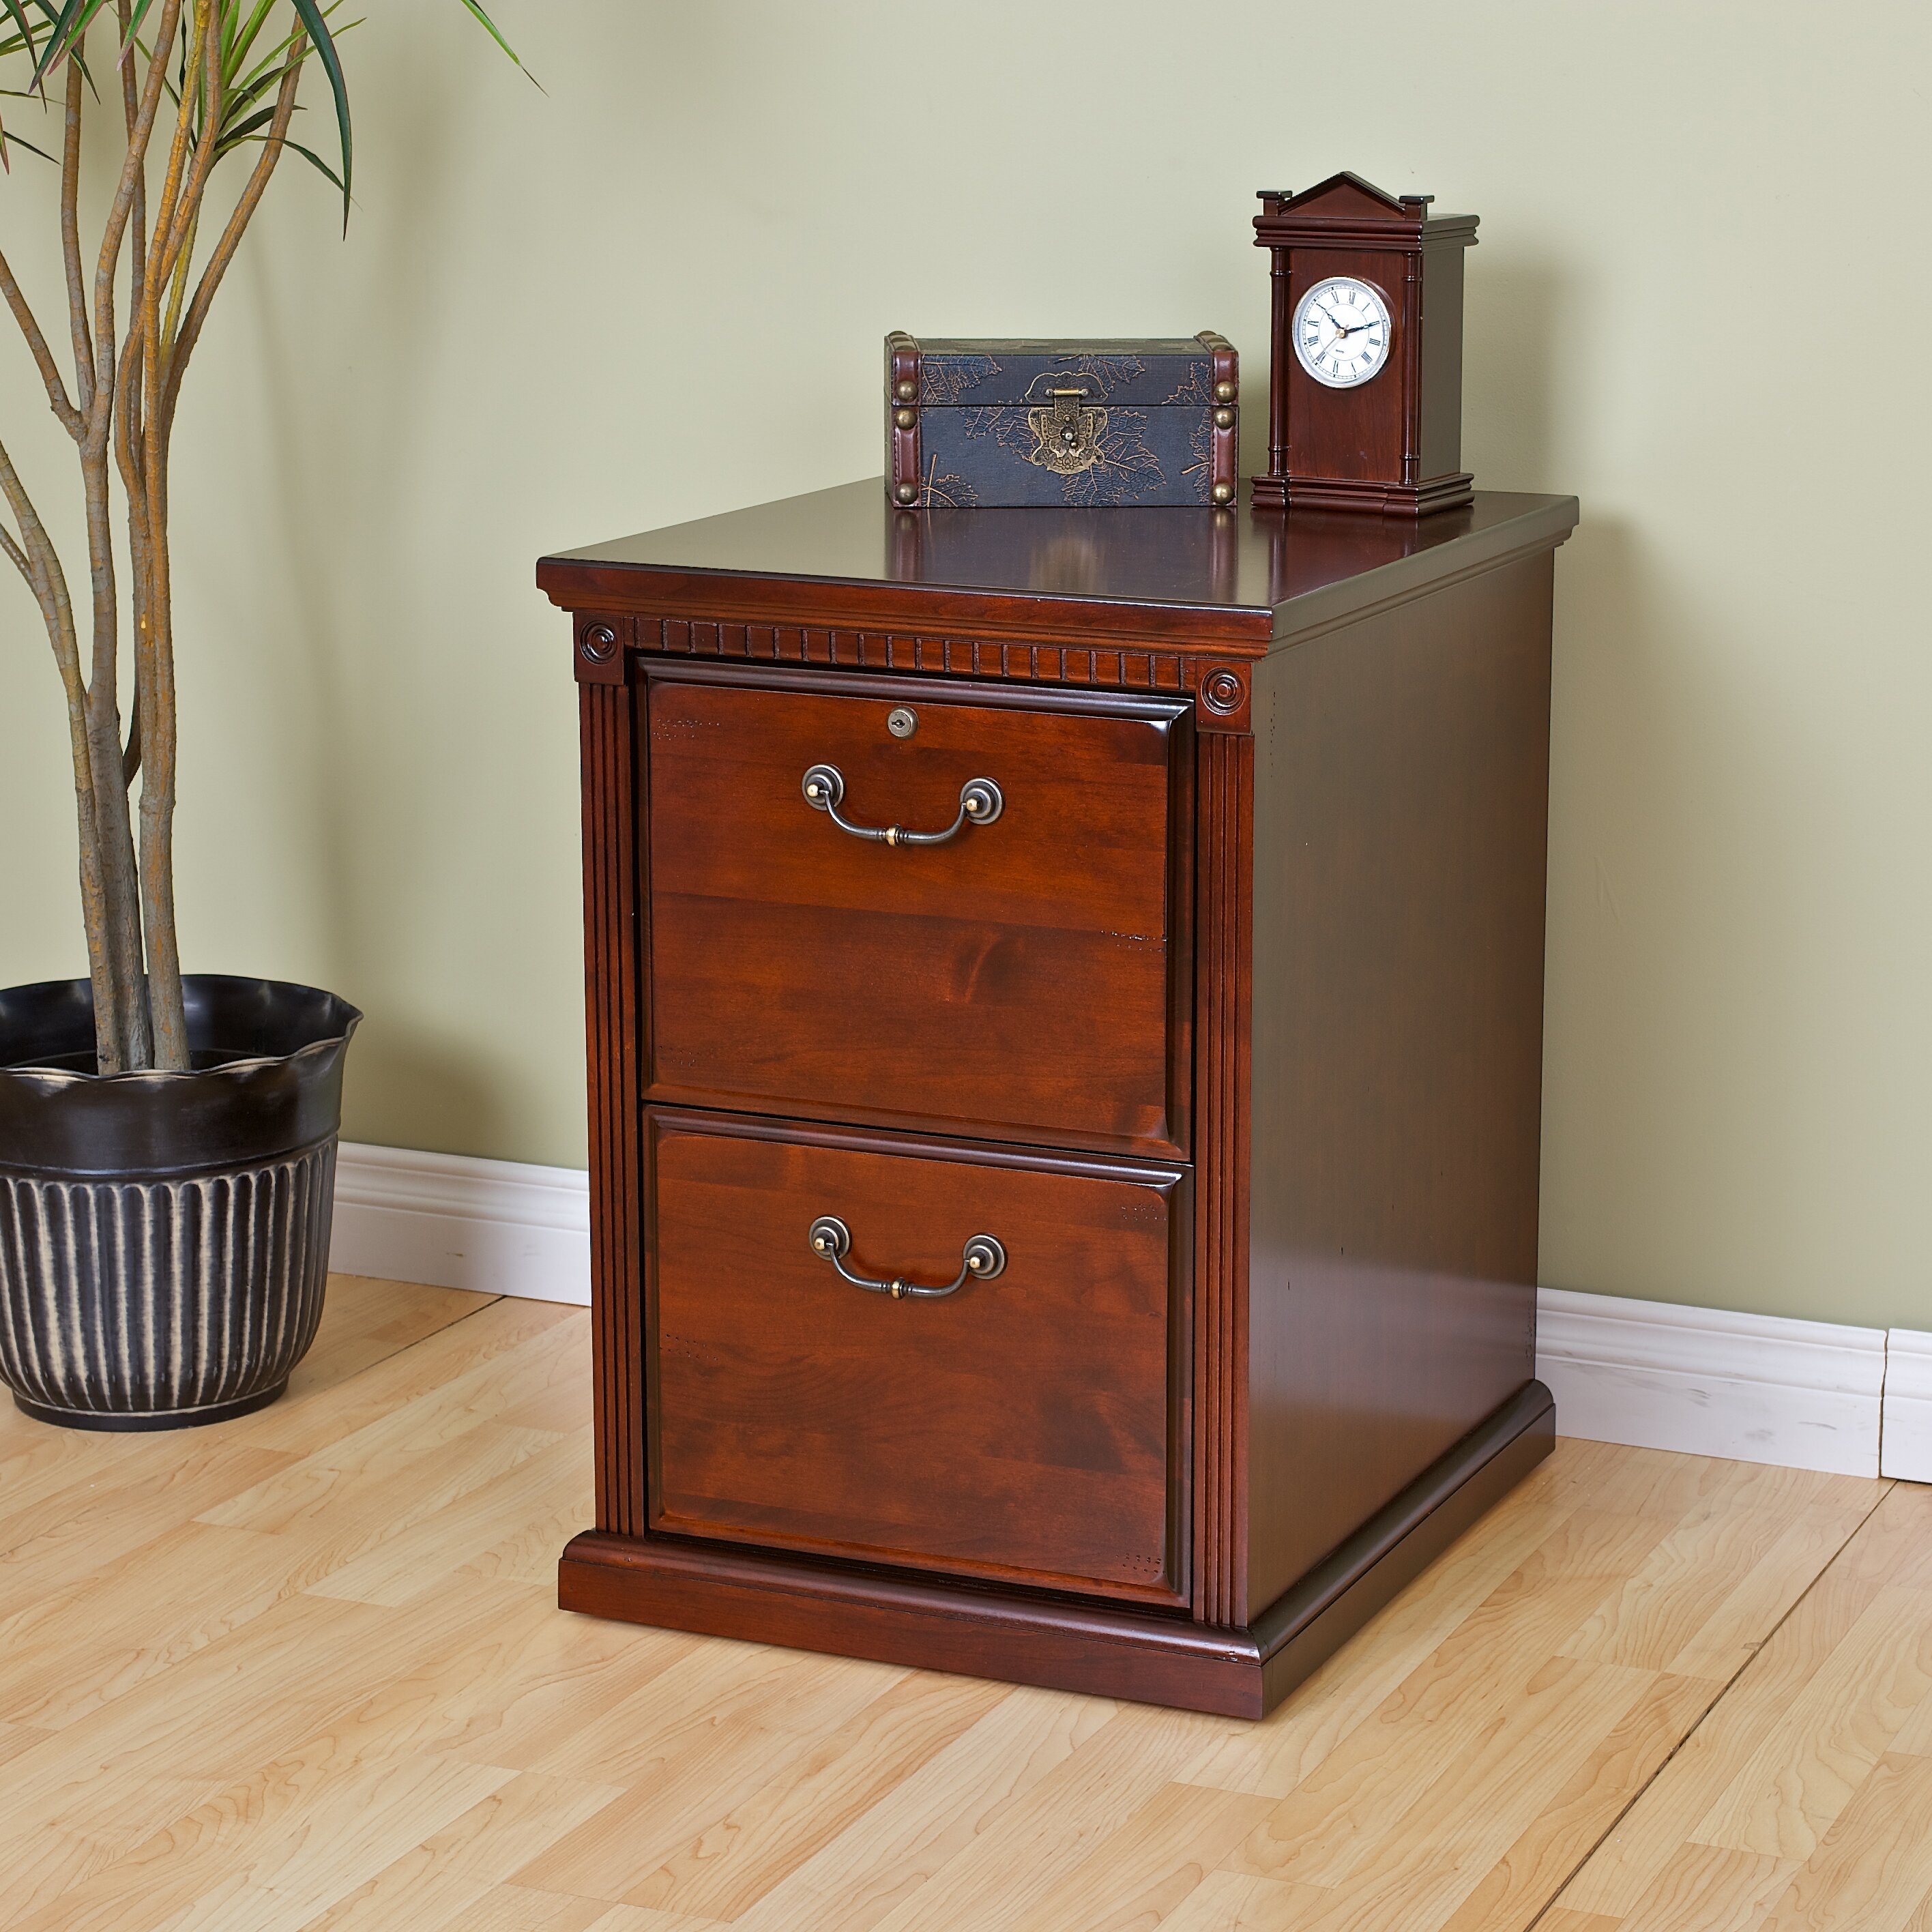 Huntington House Furniture Reviews Home Design Ideas and